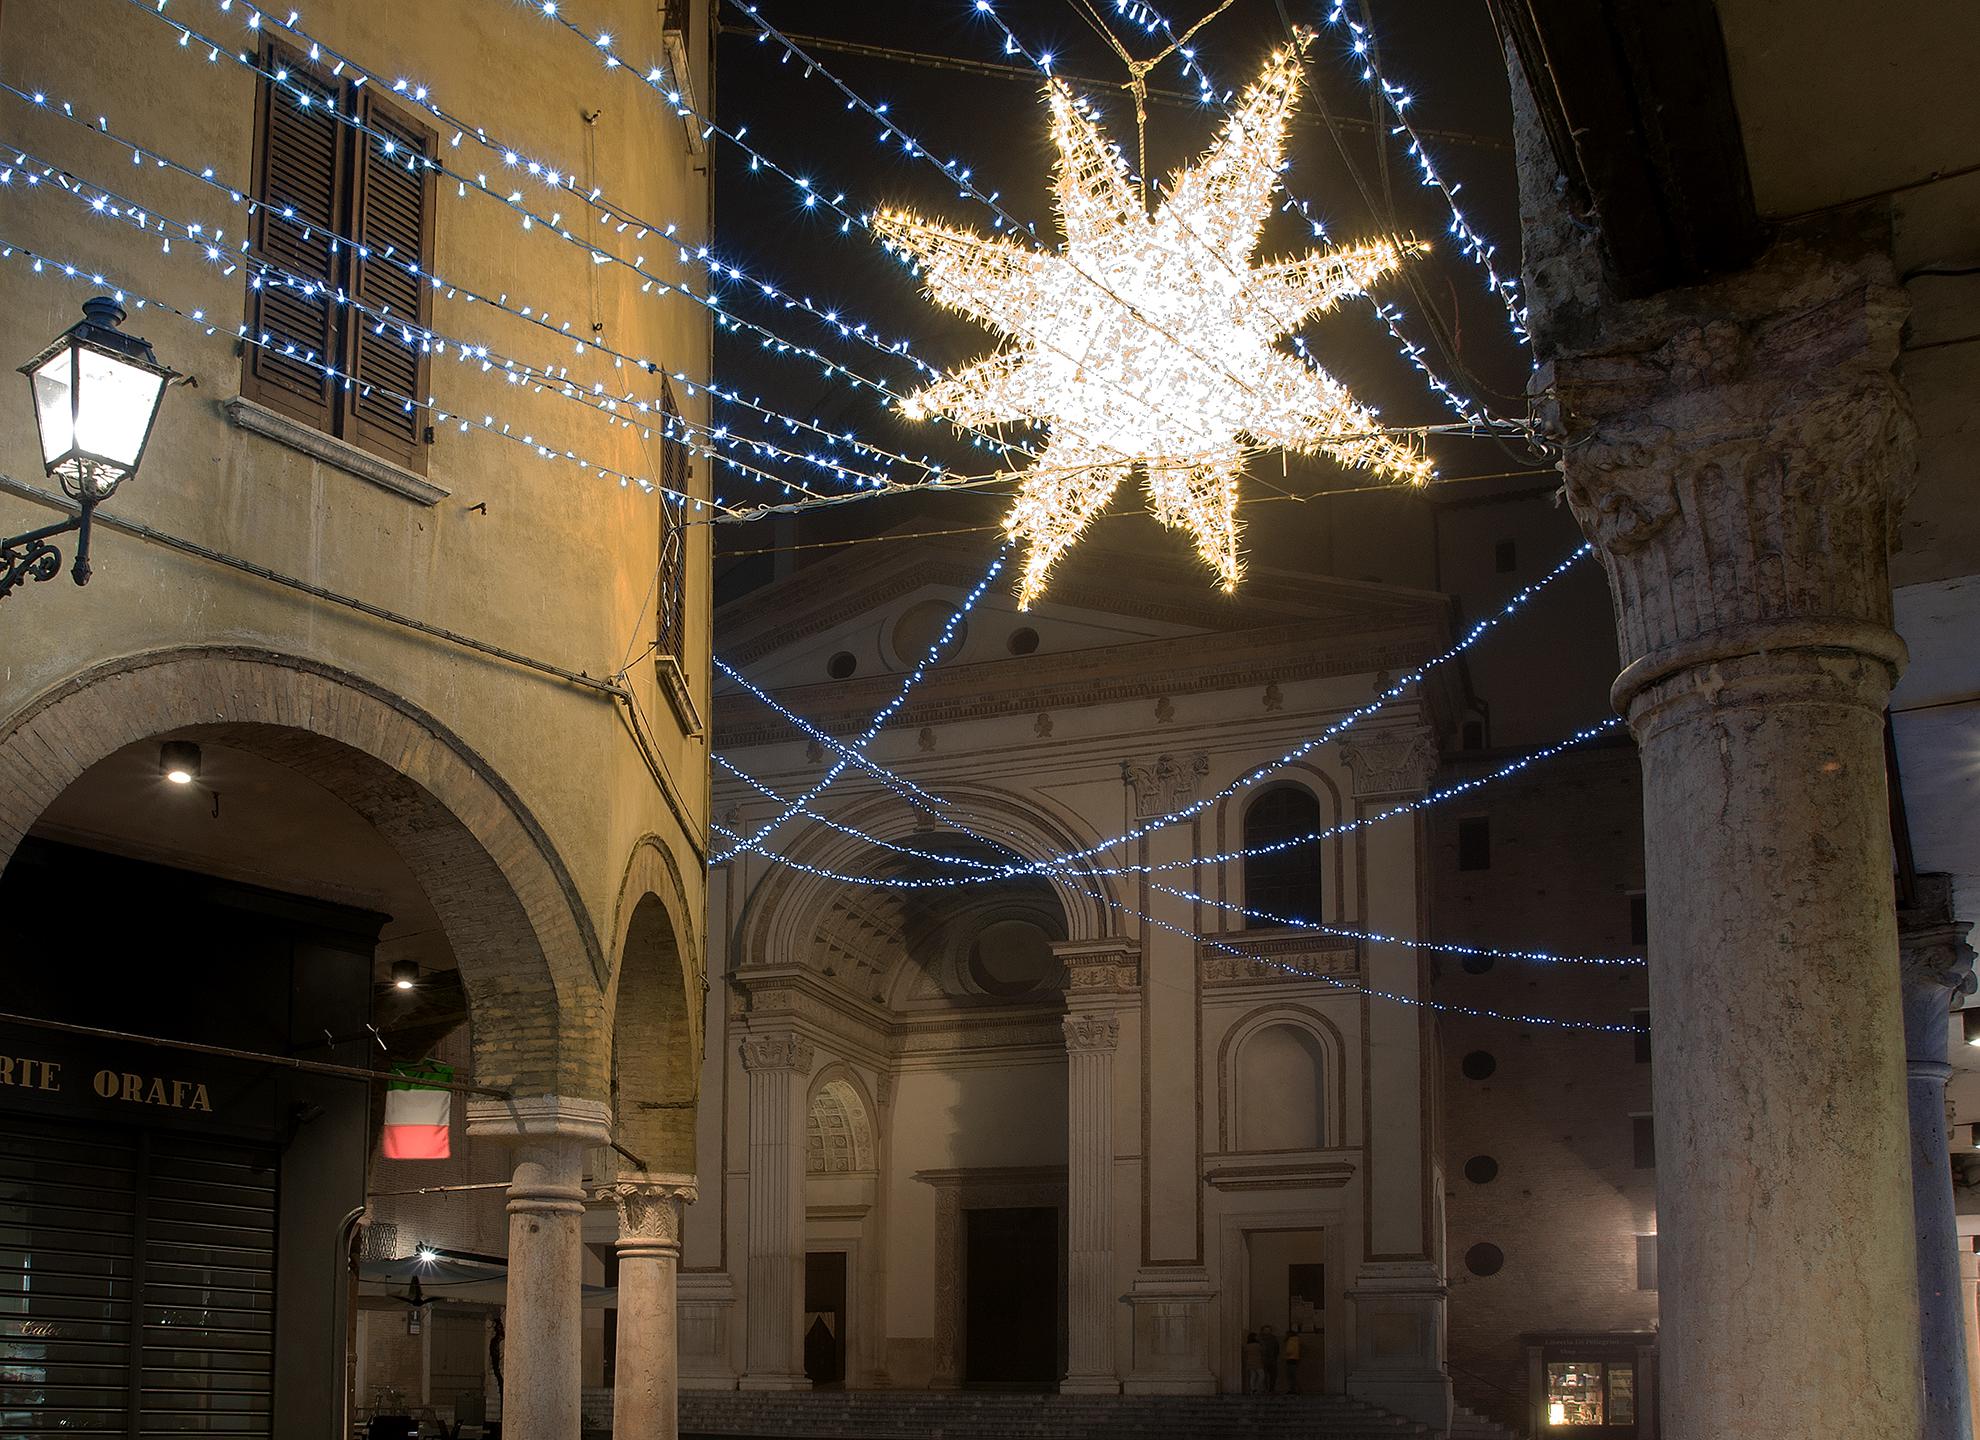 Natale....a Mantova...